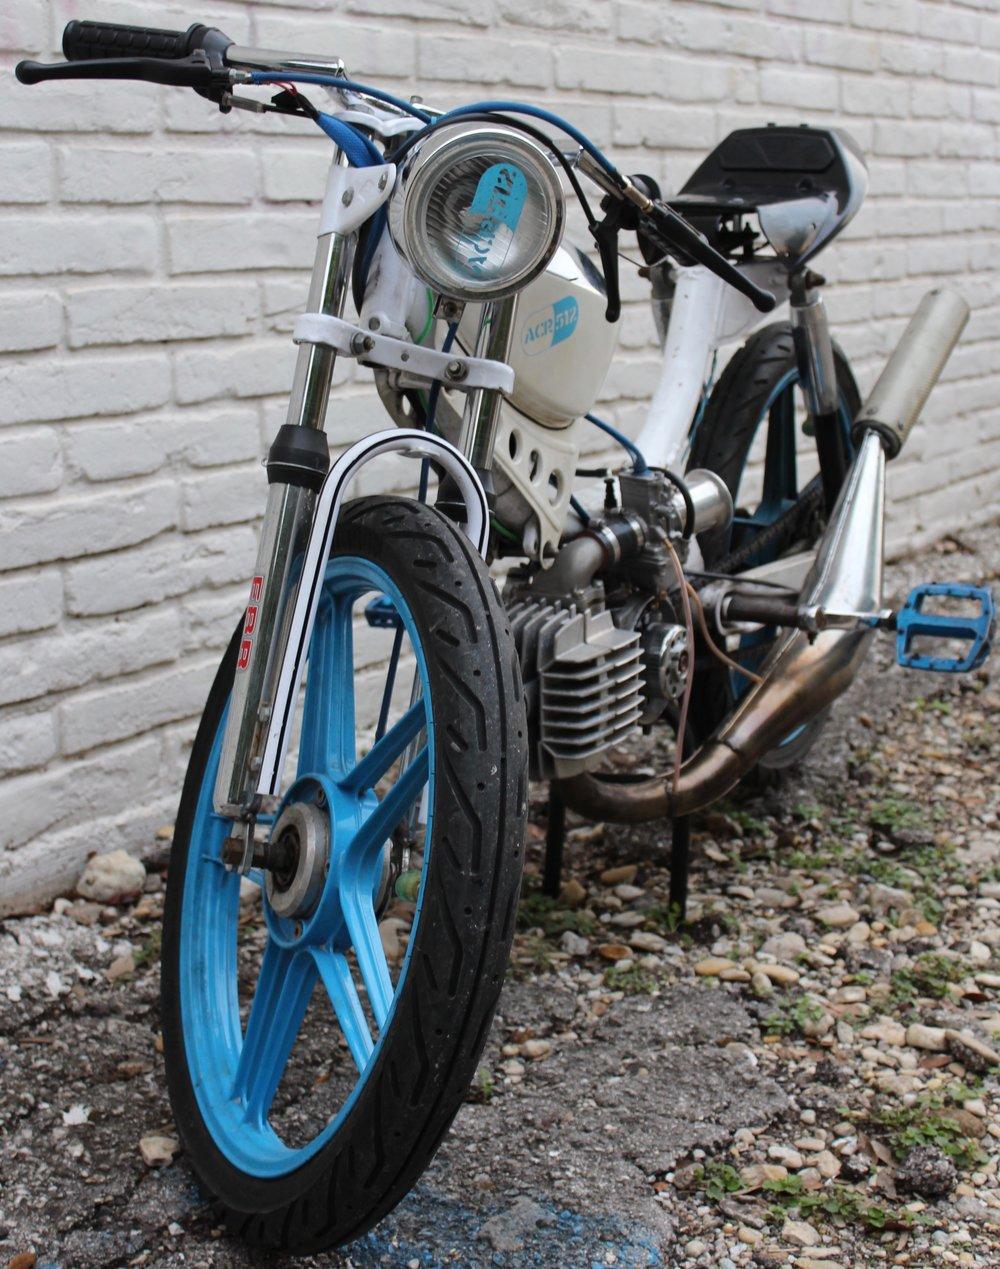 JC Penneys Pinto Custom Race Moped